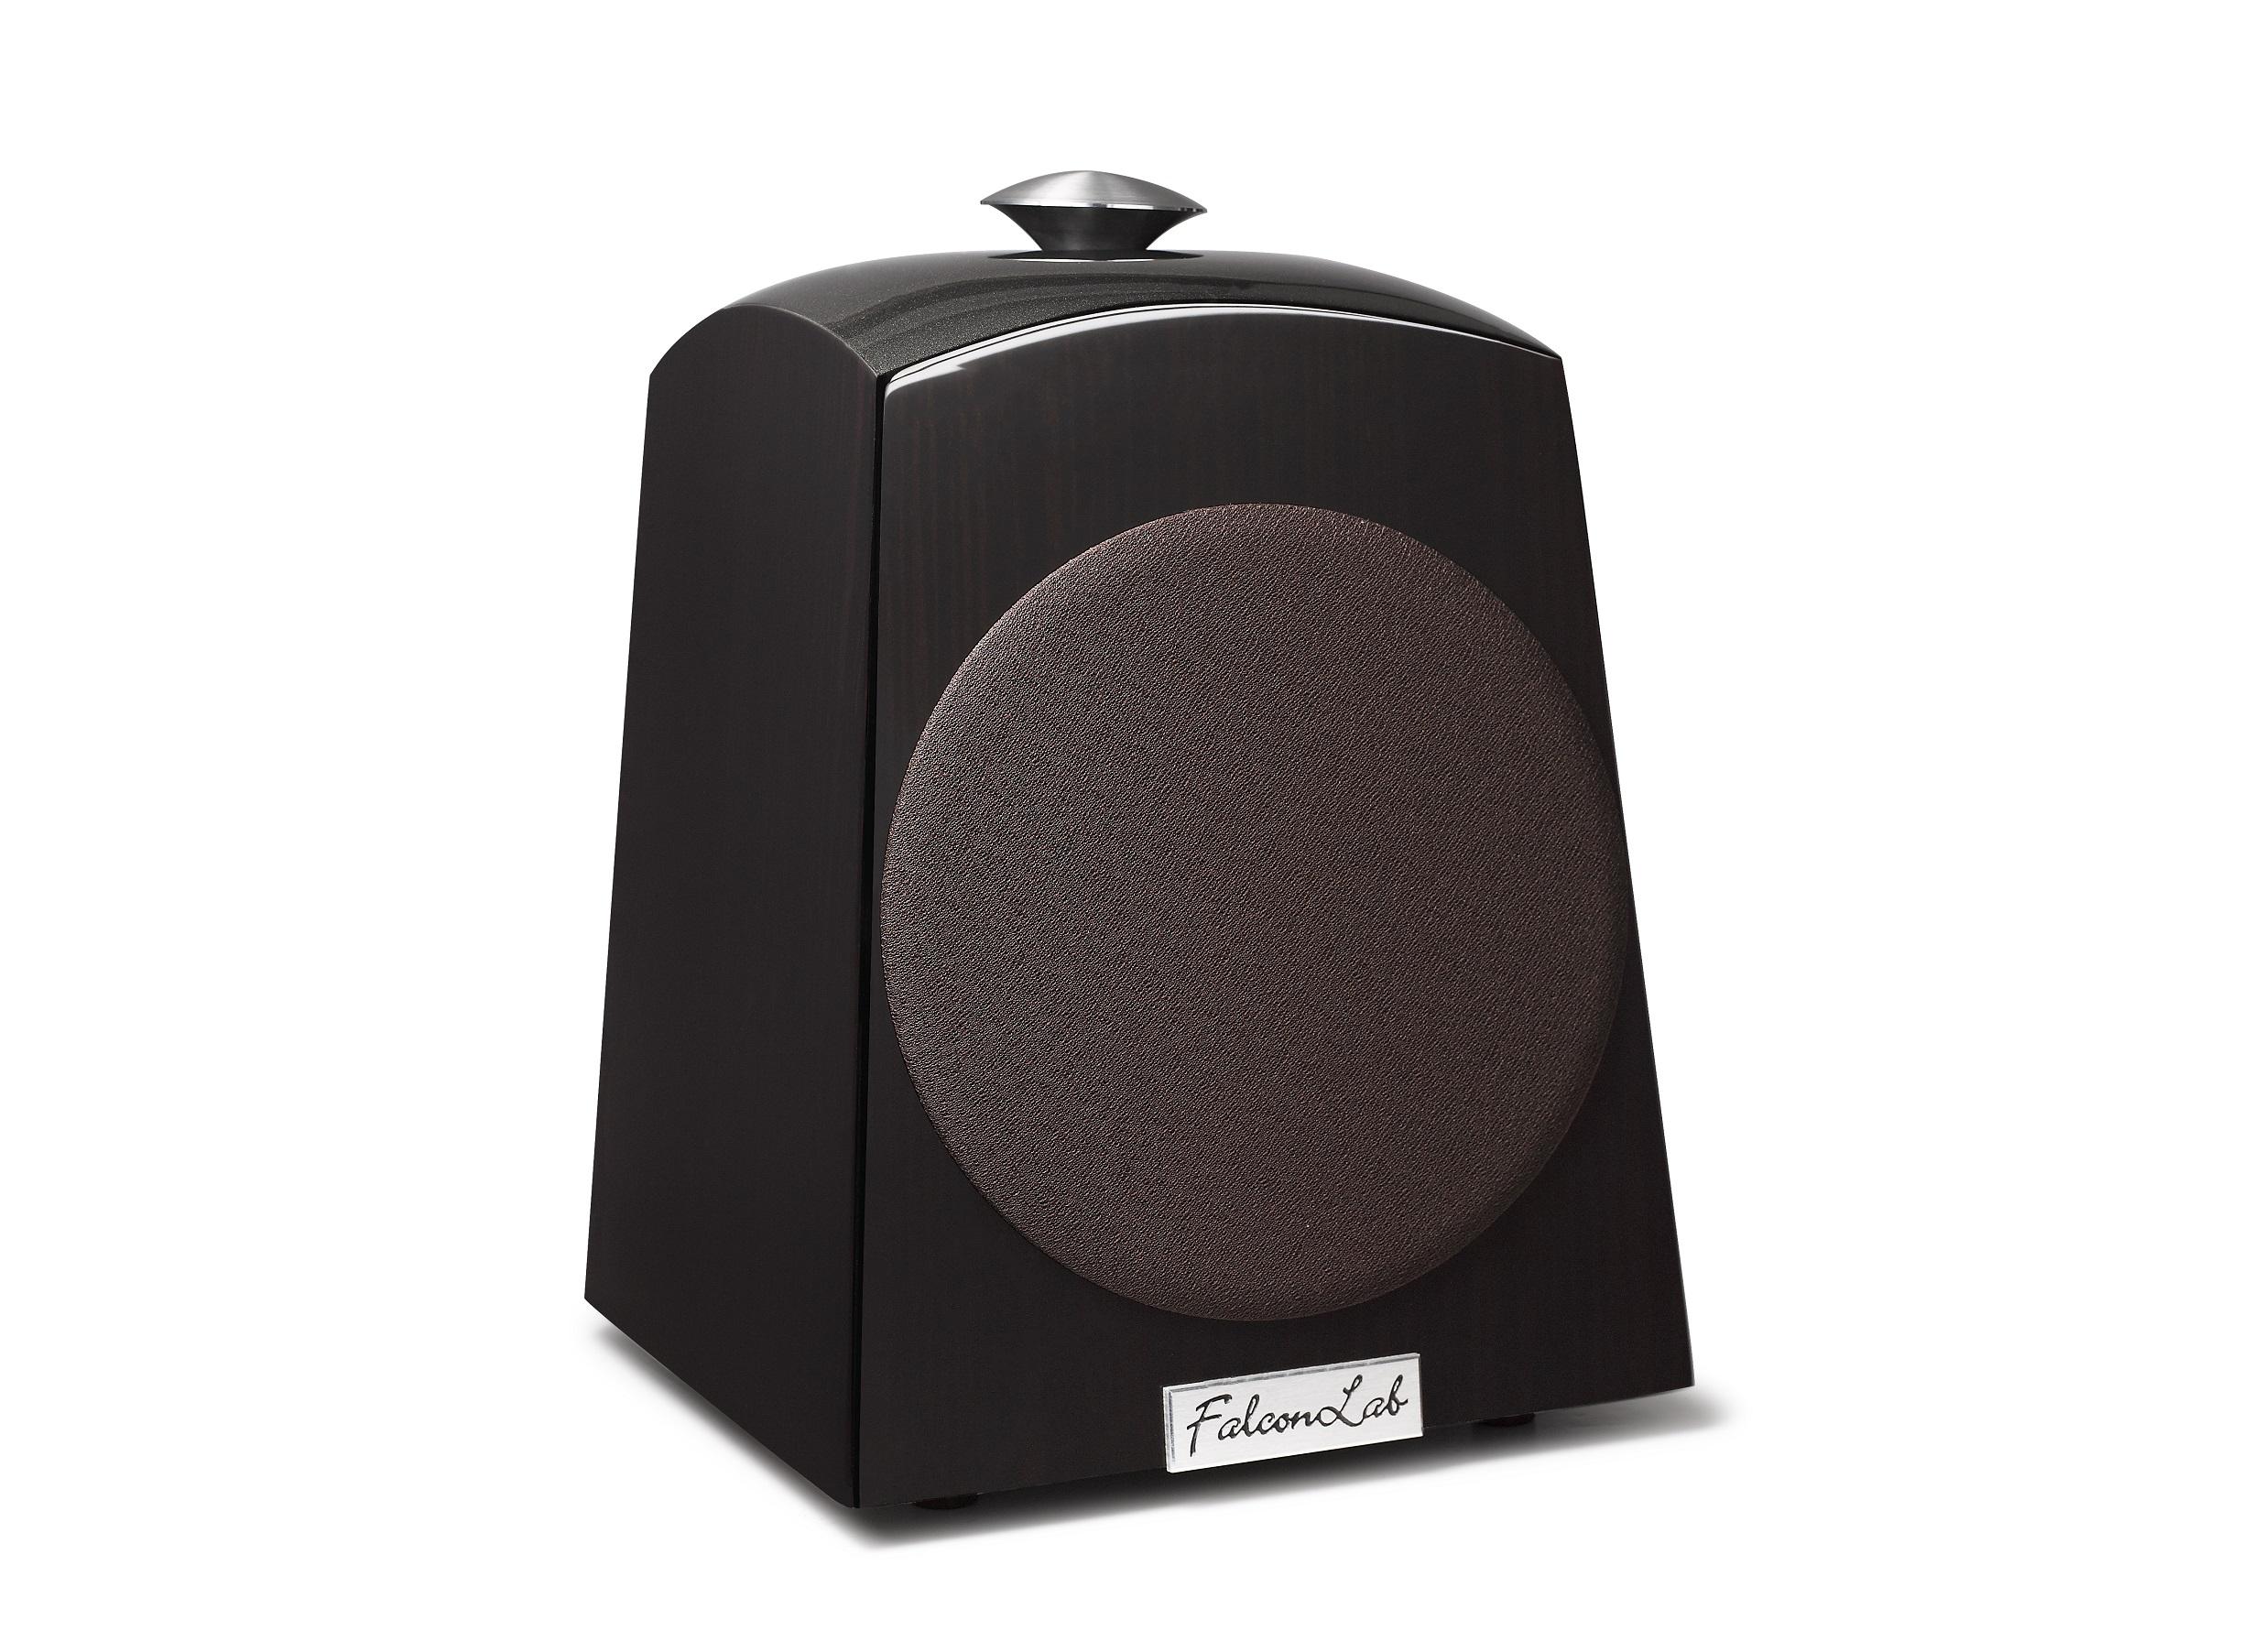 FalconLab Model301WG 全指向性スピーカーシステム (木目調ピアノ黒塗装)